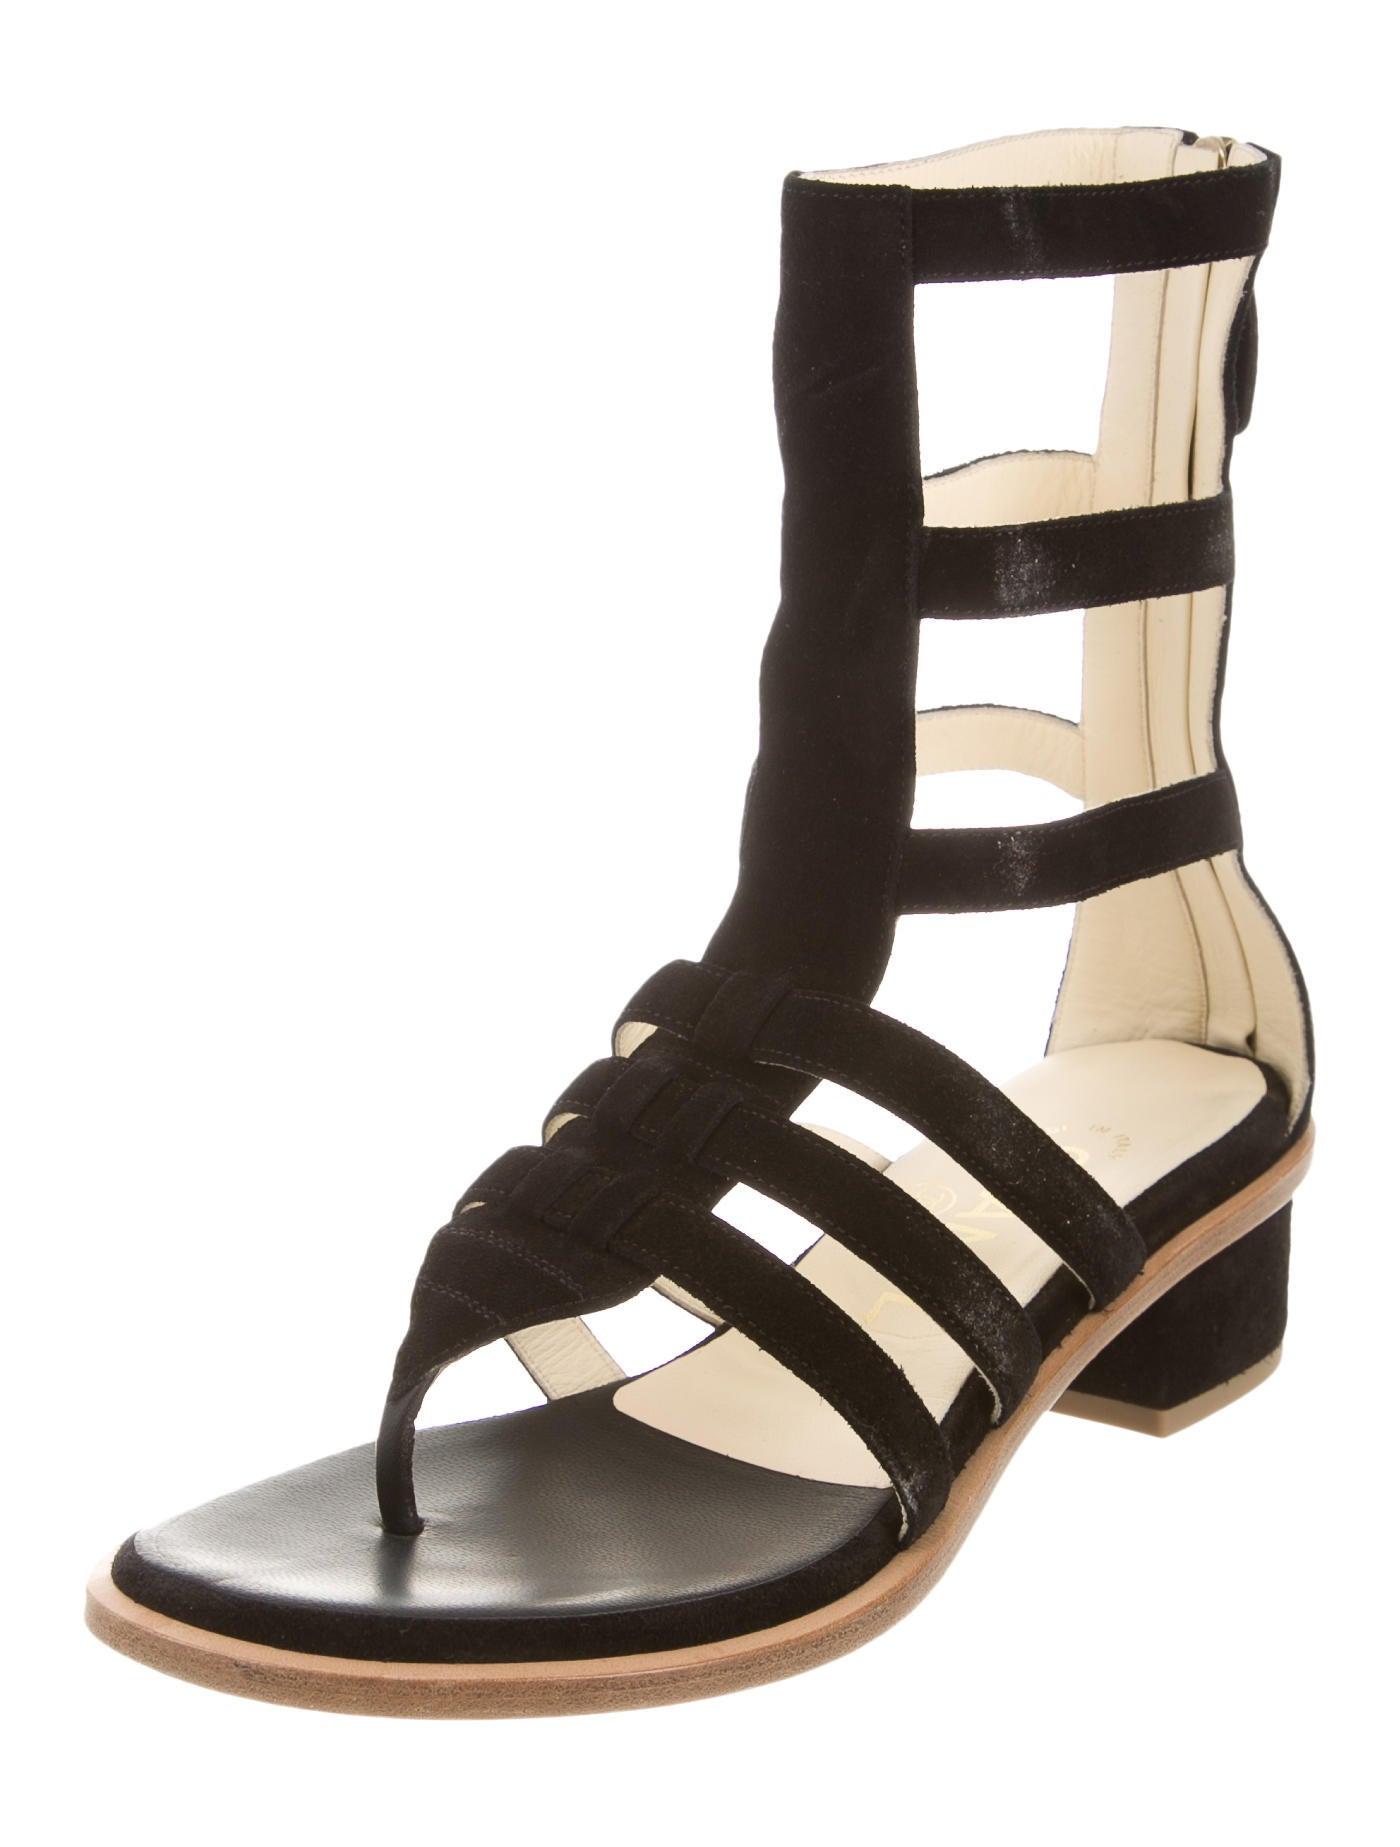 Chanel Spring/Summer 2015 Gladiator Sandals